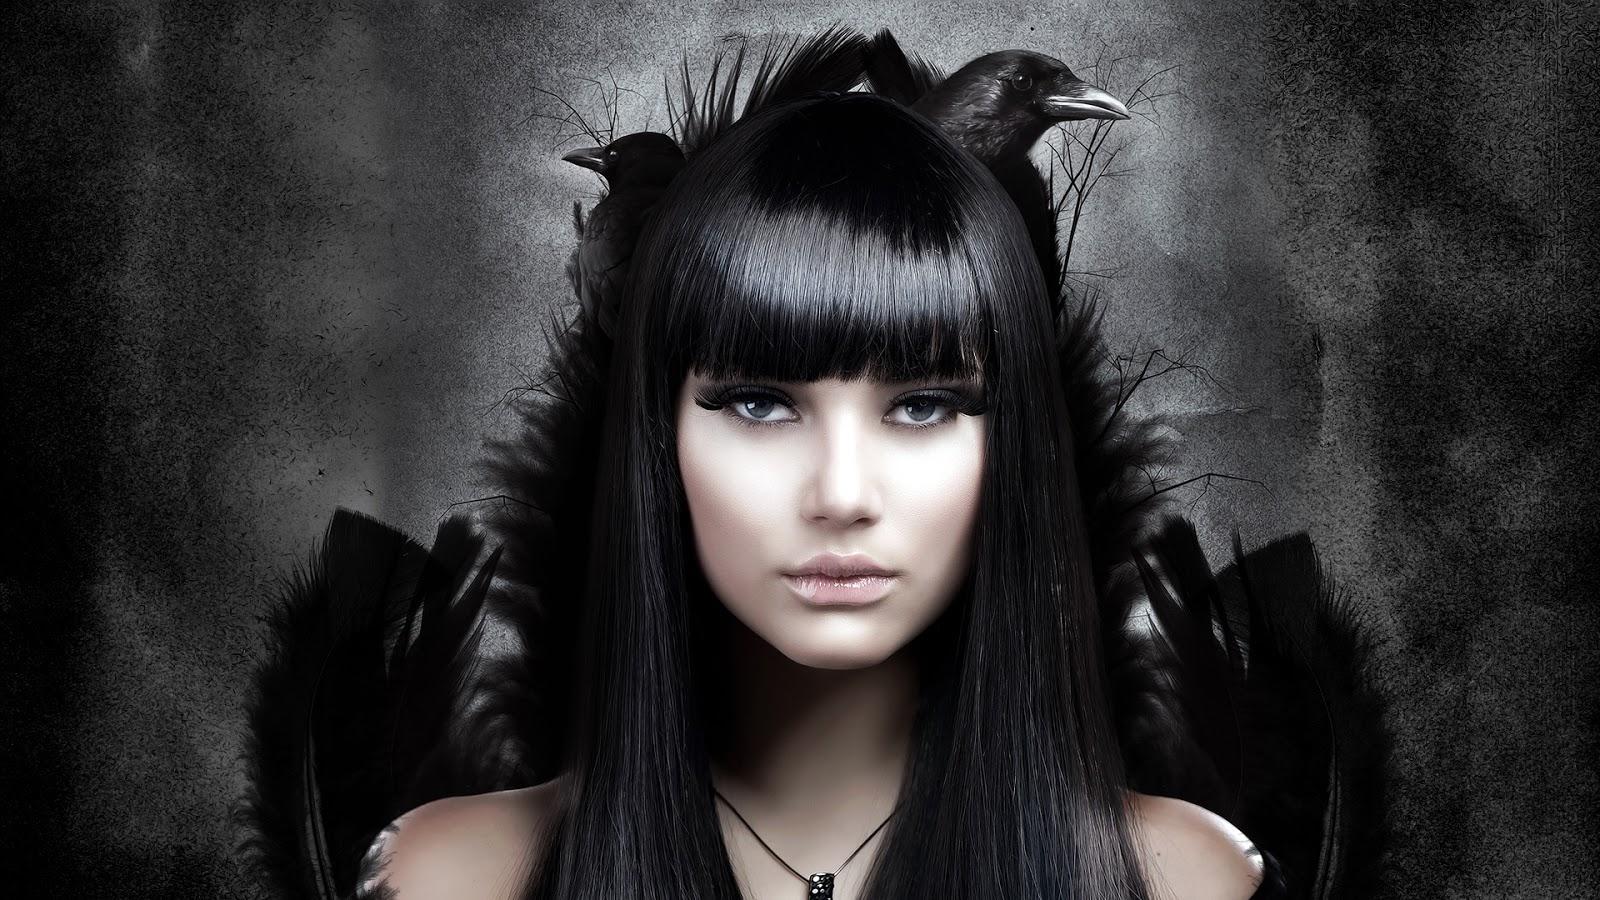 http://4.bp.blogspot.com/-OhYN67Xxvyw/UMlJJgzffII/AAAAAAAAJyg/pGaDuvZc6Vg/s1600/black-crow-girl.jpg